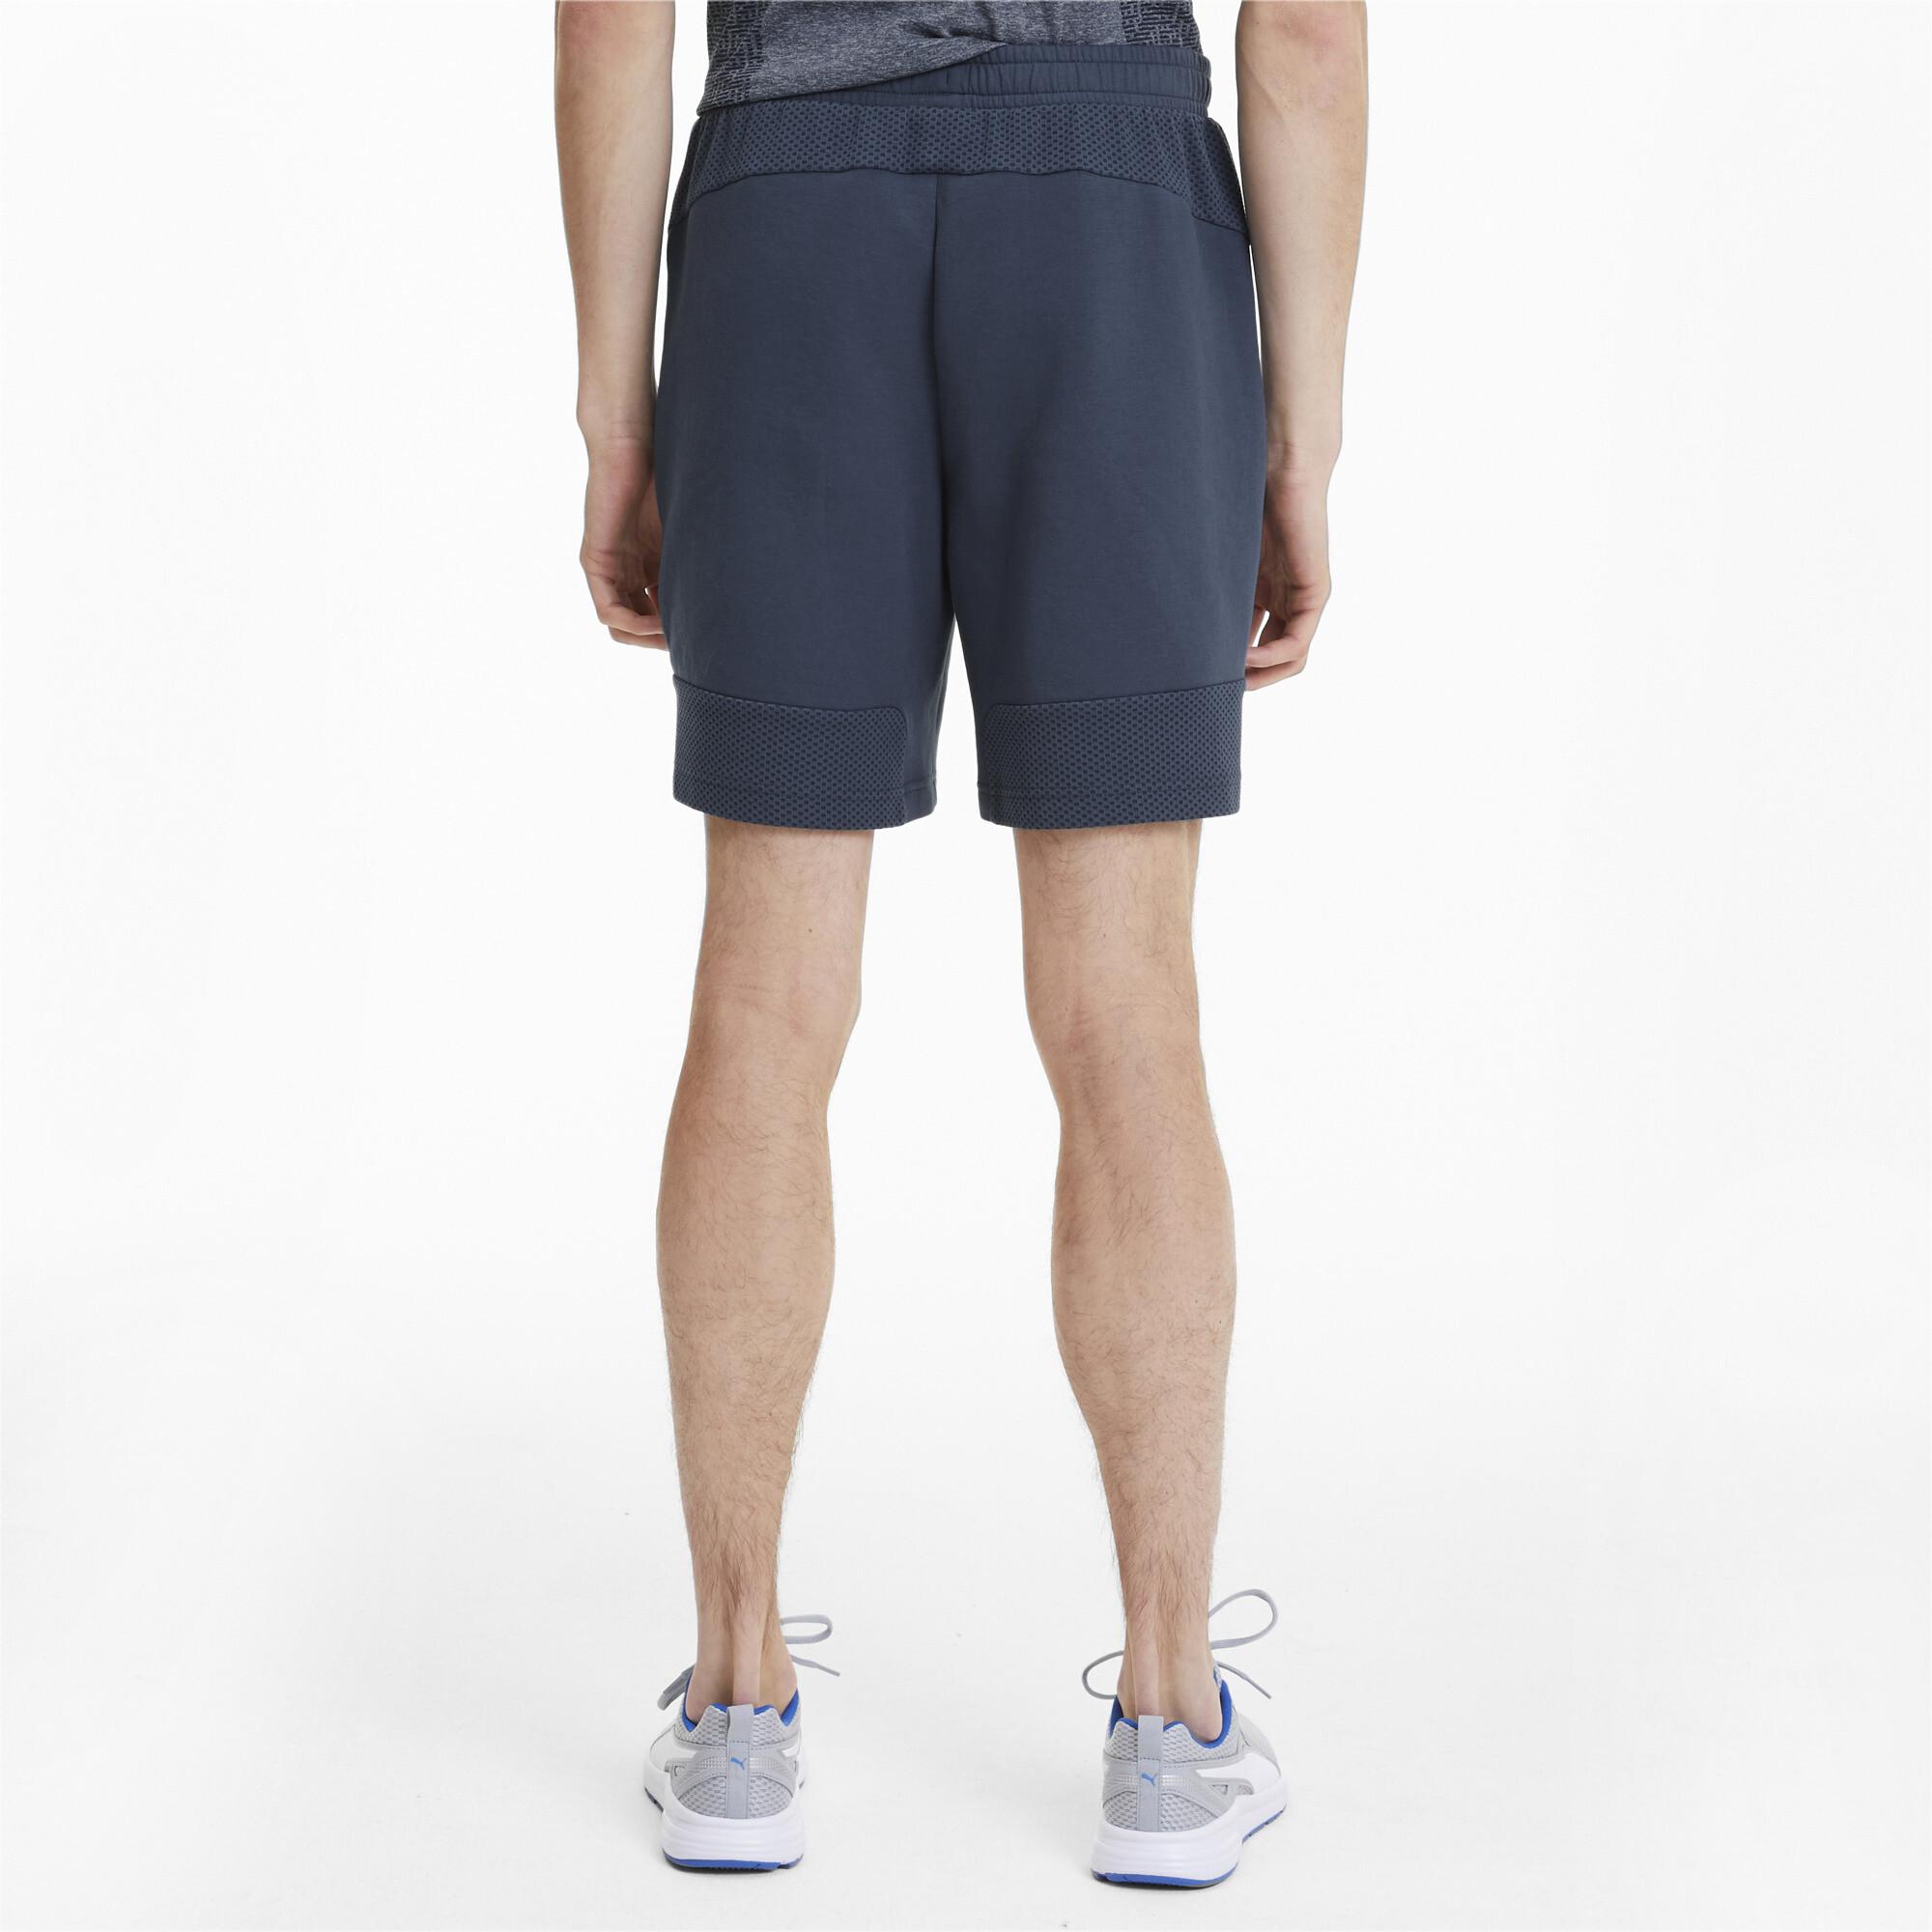 PUMA-Evostripe-Men-039-s-Shorts-Men-Knitted-Shorts-Basics thumbnail 10